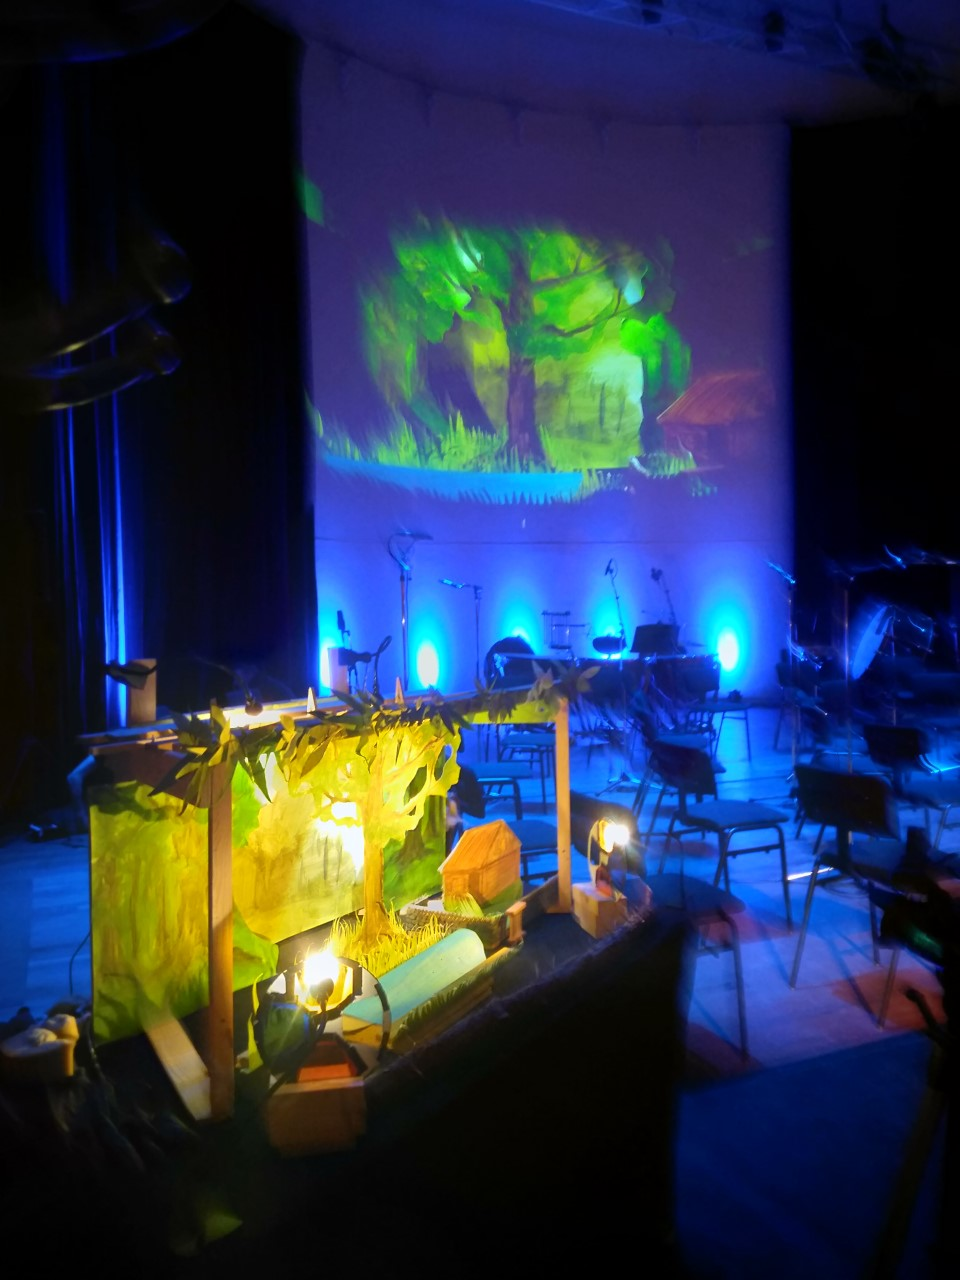 Peter en de Wolf, Theater Hanzehof, Zutphen (2019) - In opdracht